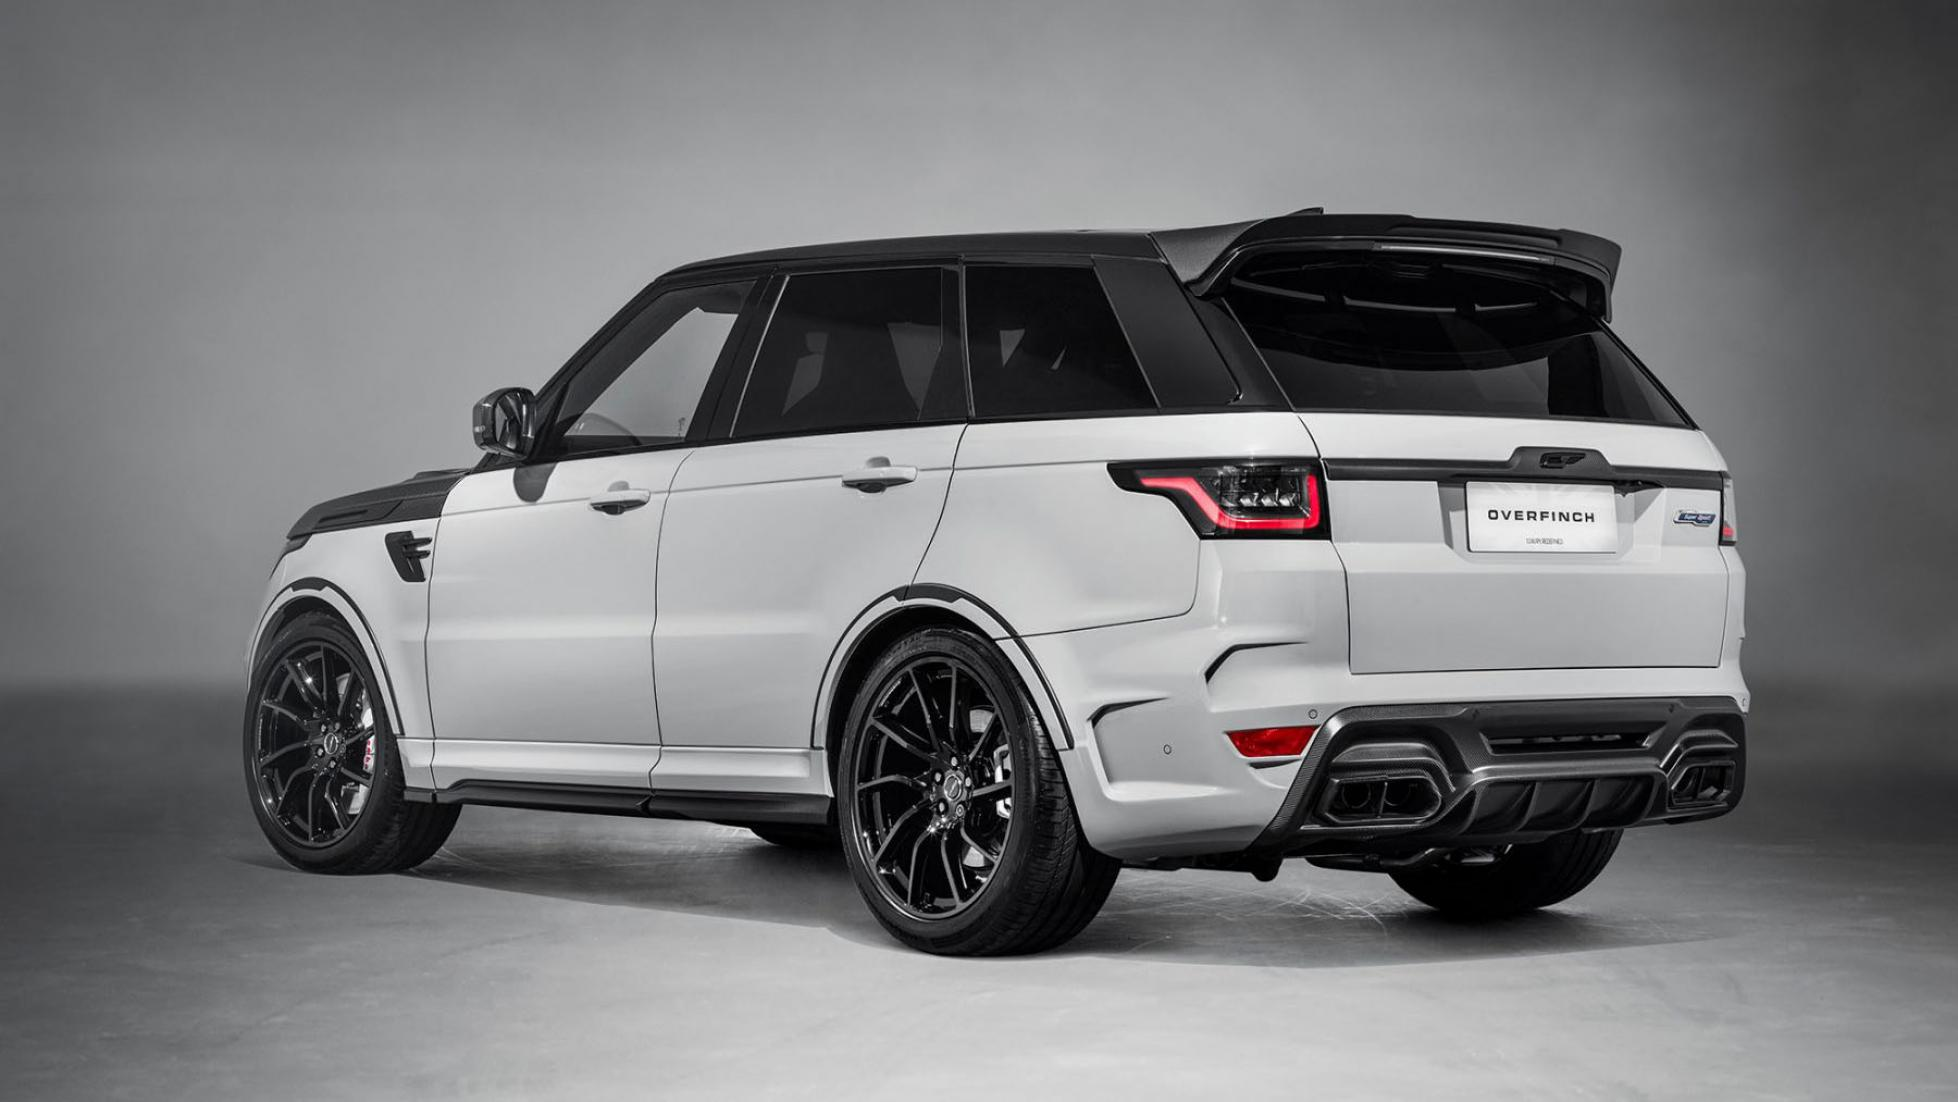 Overfinch Range Rover Sport SVR Supersport